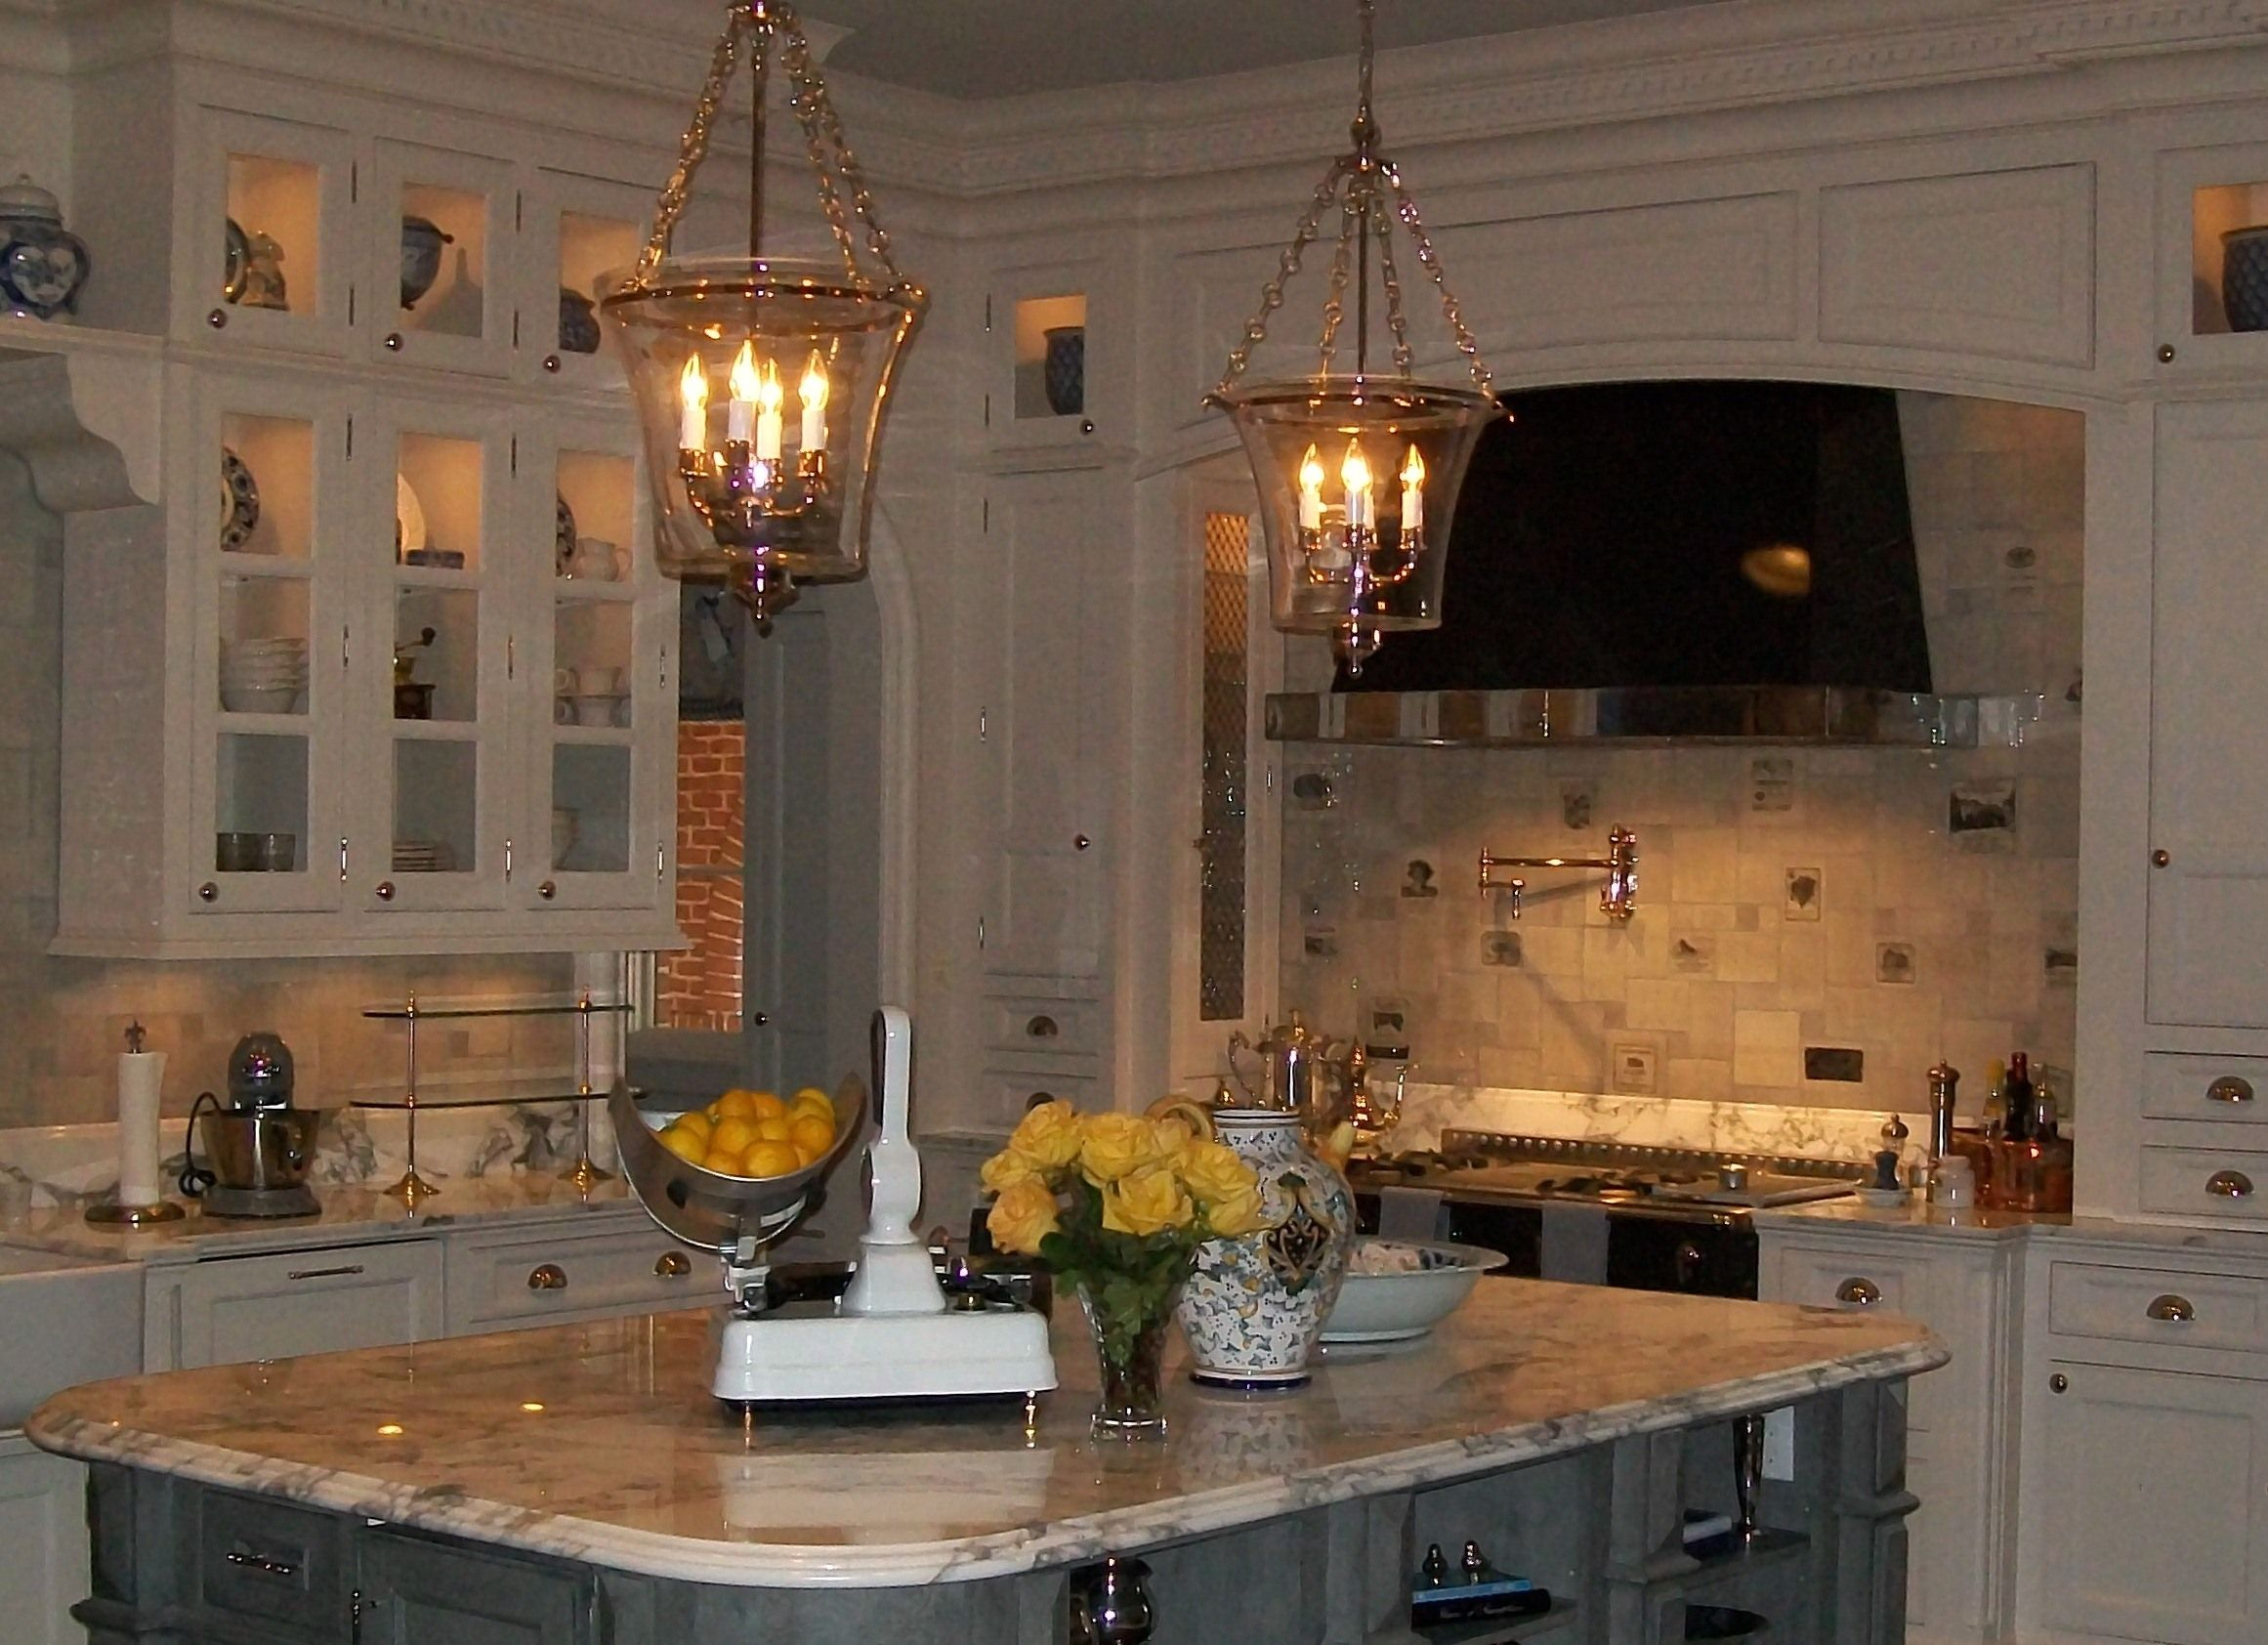 Grey wash tiles / kitchen splash / wine labels - hand painted